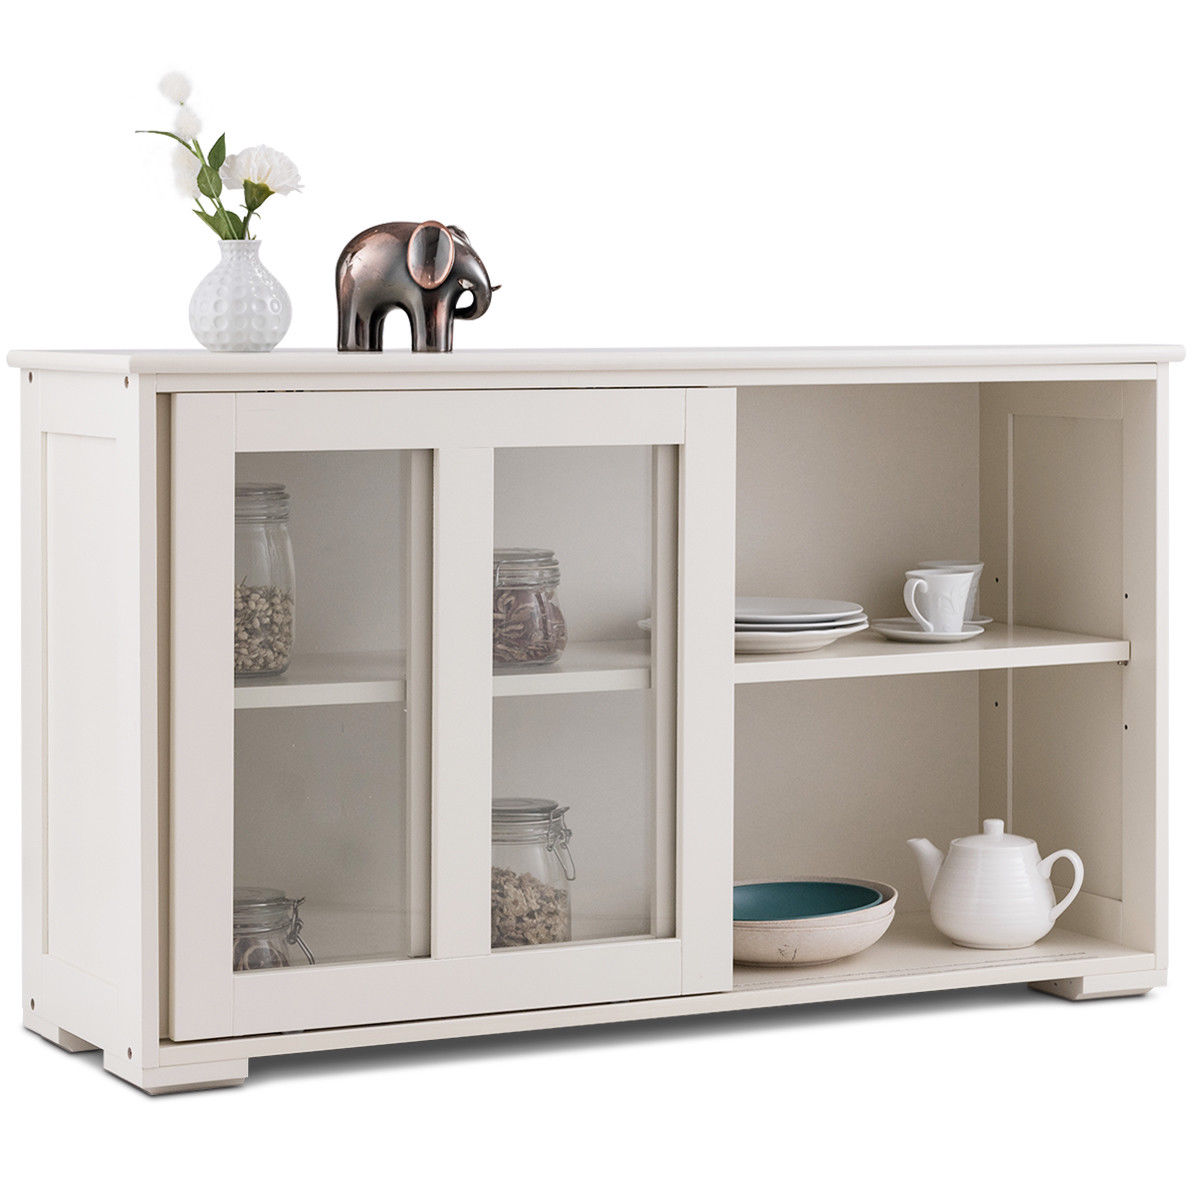 Costway Storage Cabinet Sideboard Buffet Cupboard Glass Sliding Door Pantry Kitchen New   - title=